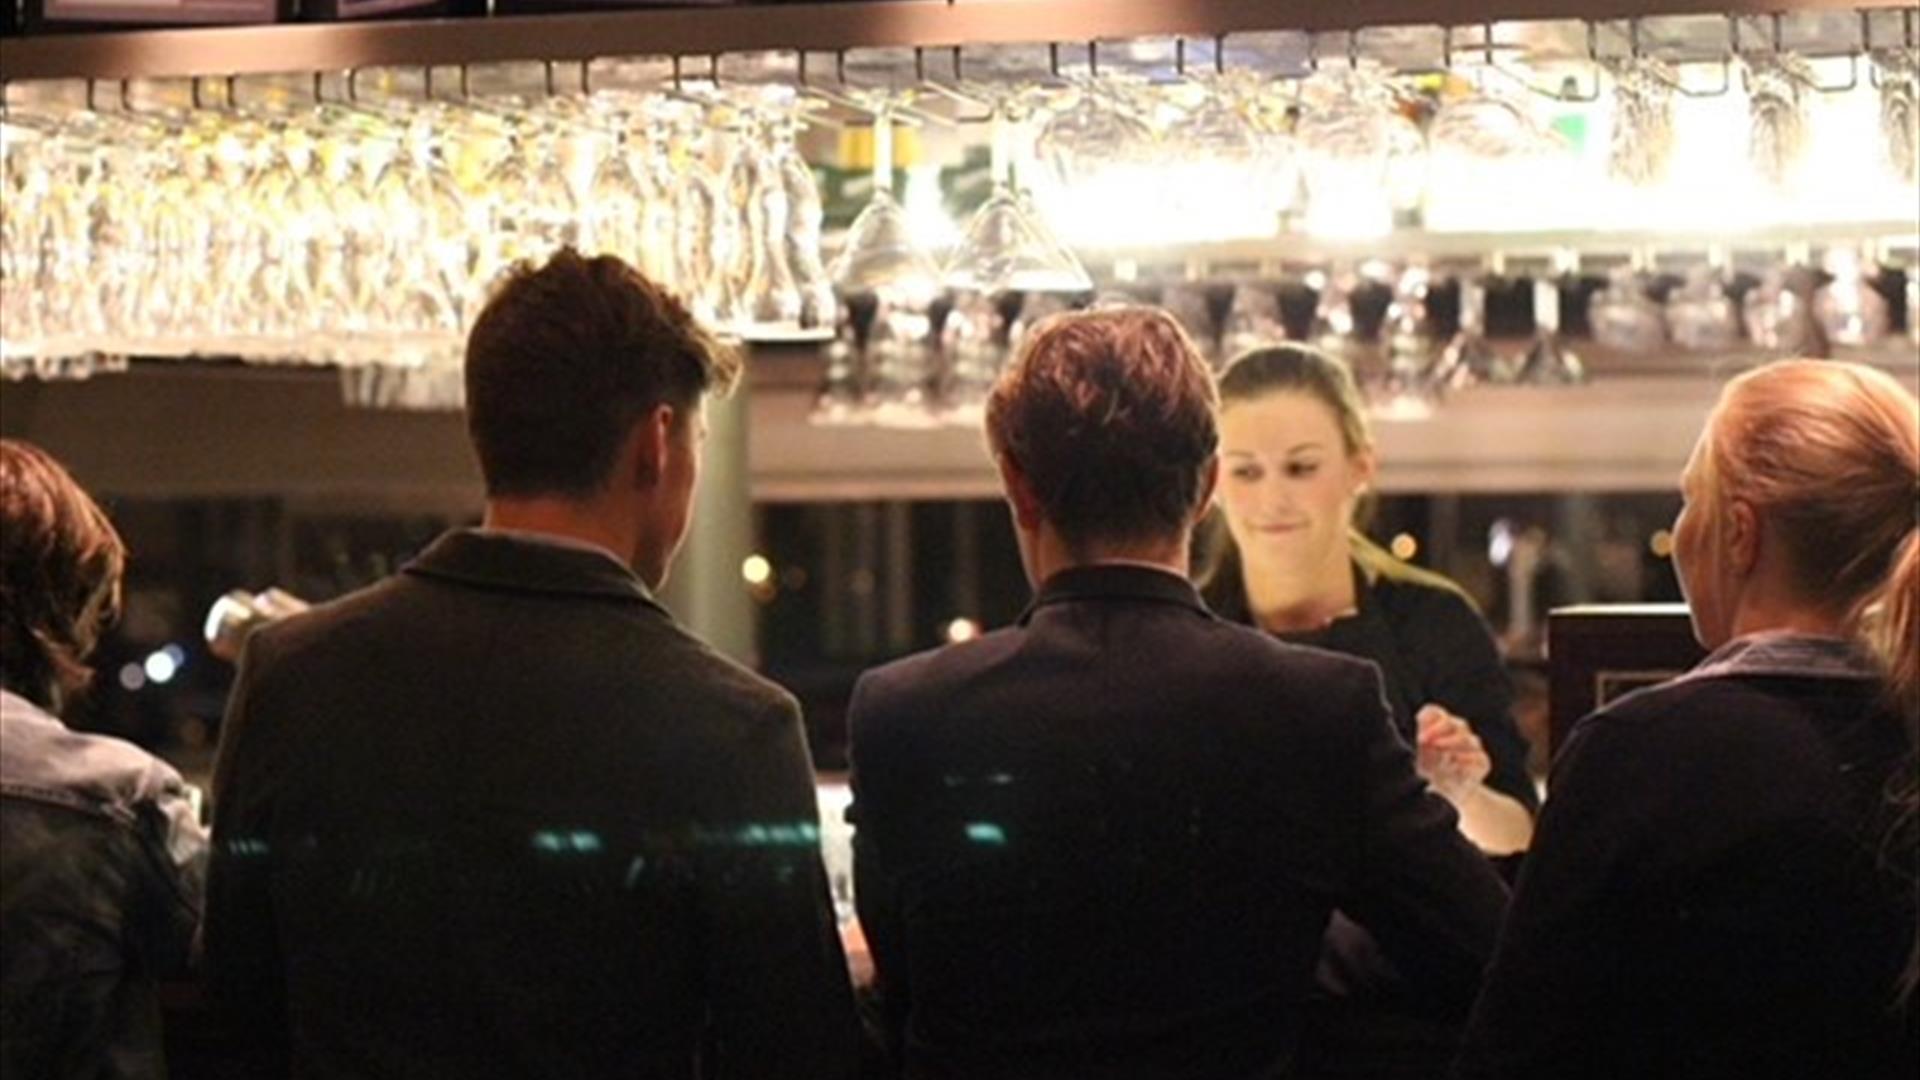 Tha bar area at Toppen bar